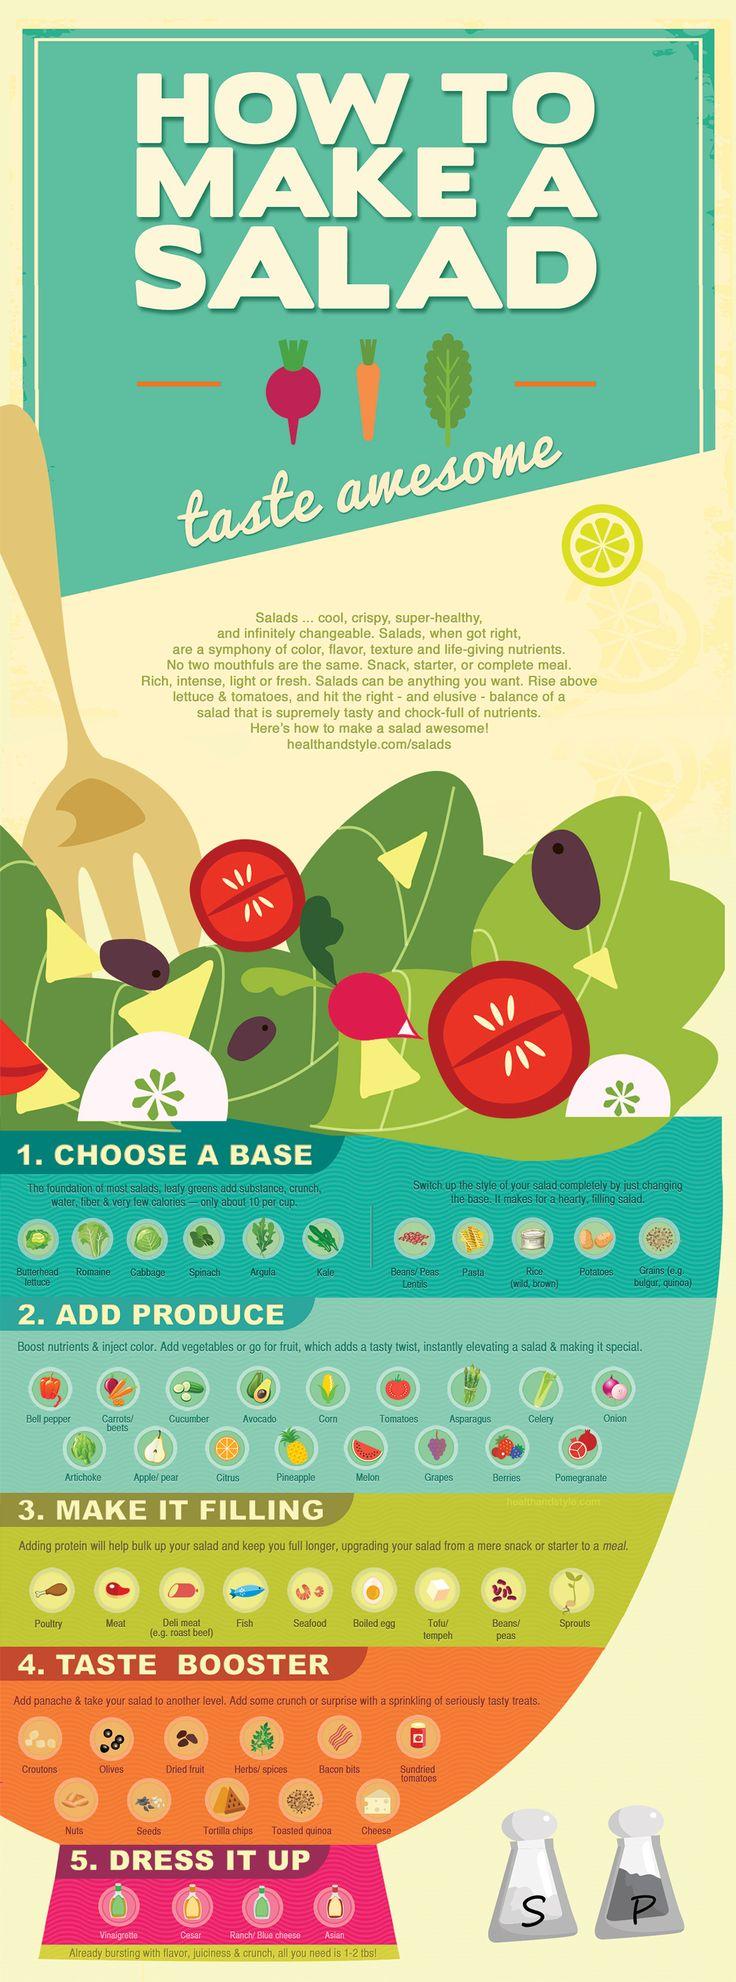 How to make a salad taste awesome!!